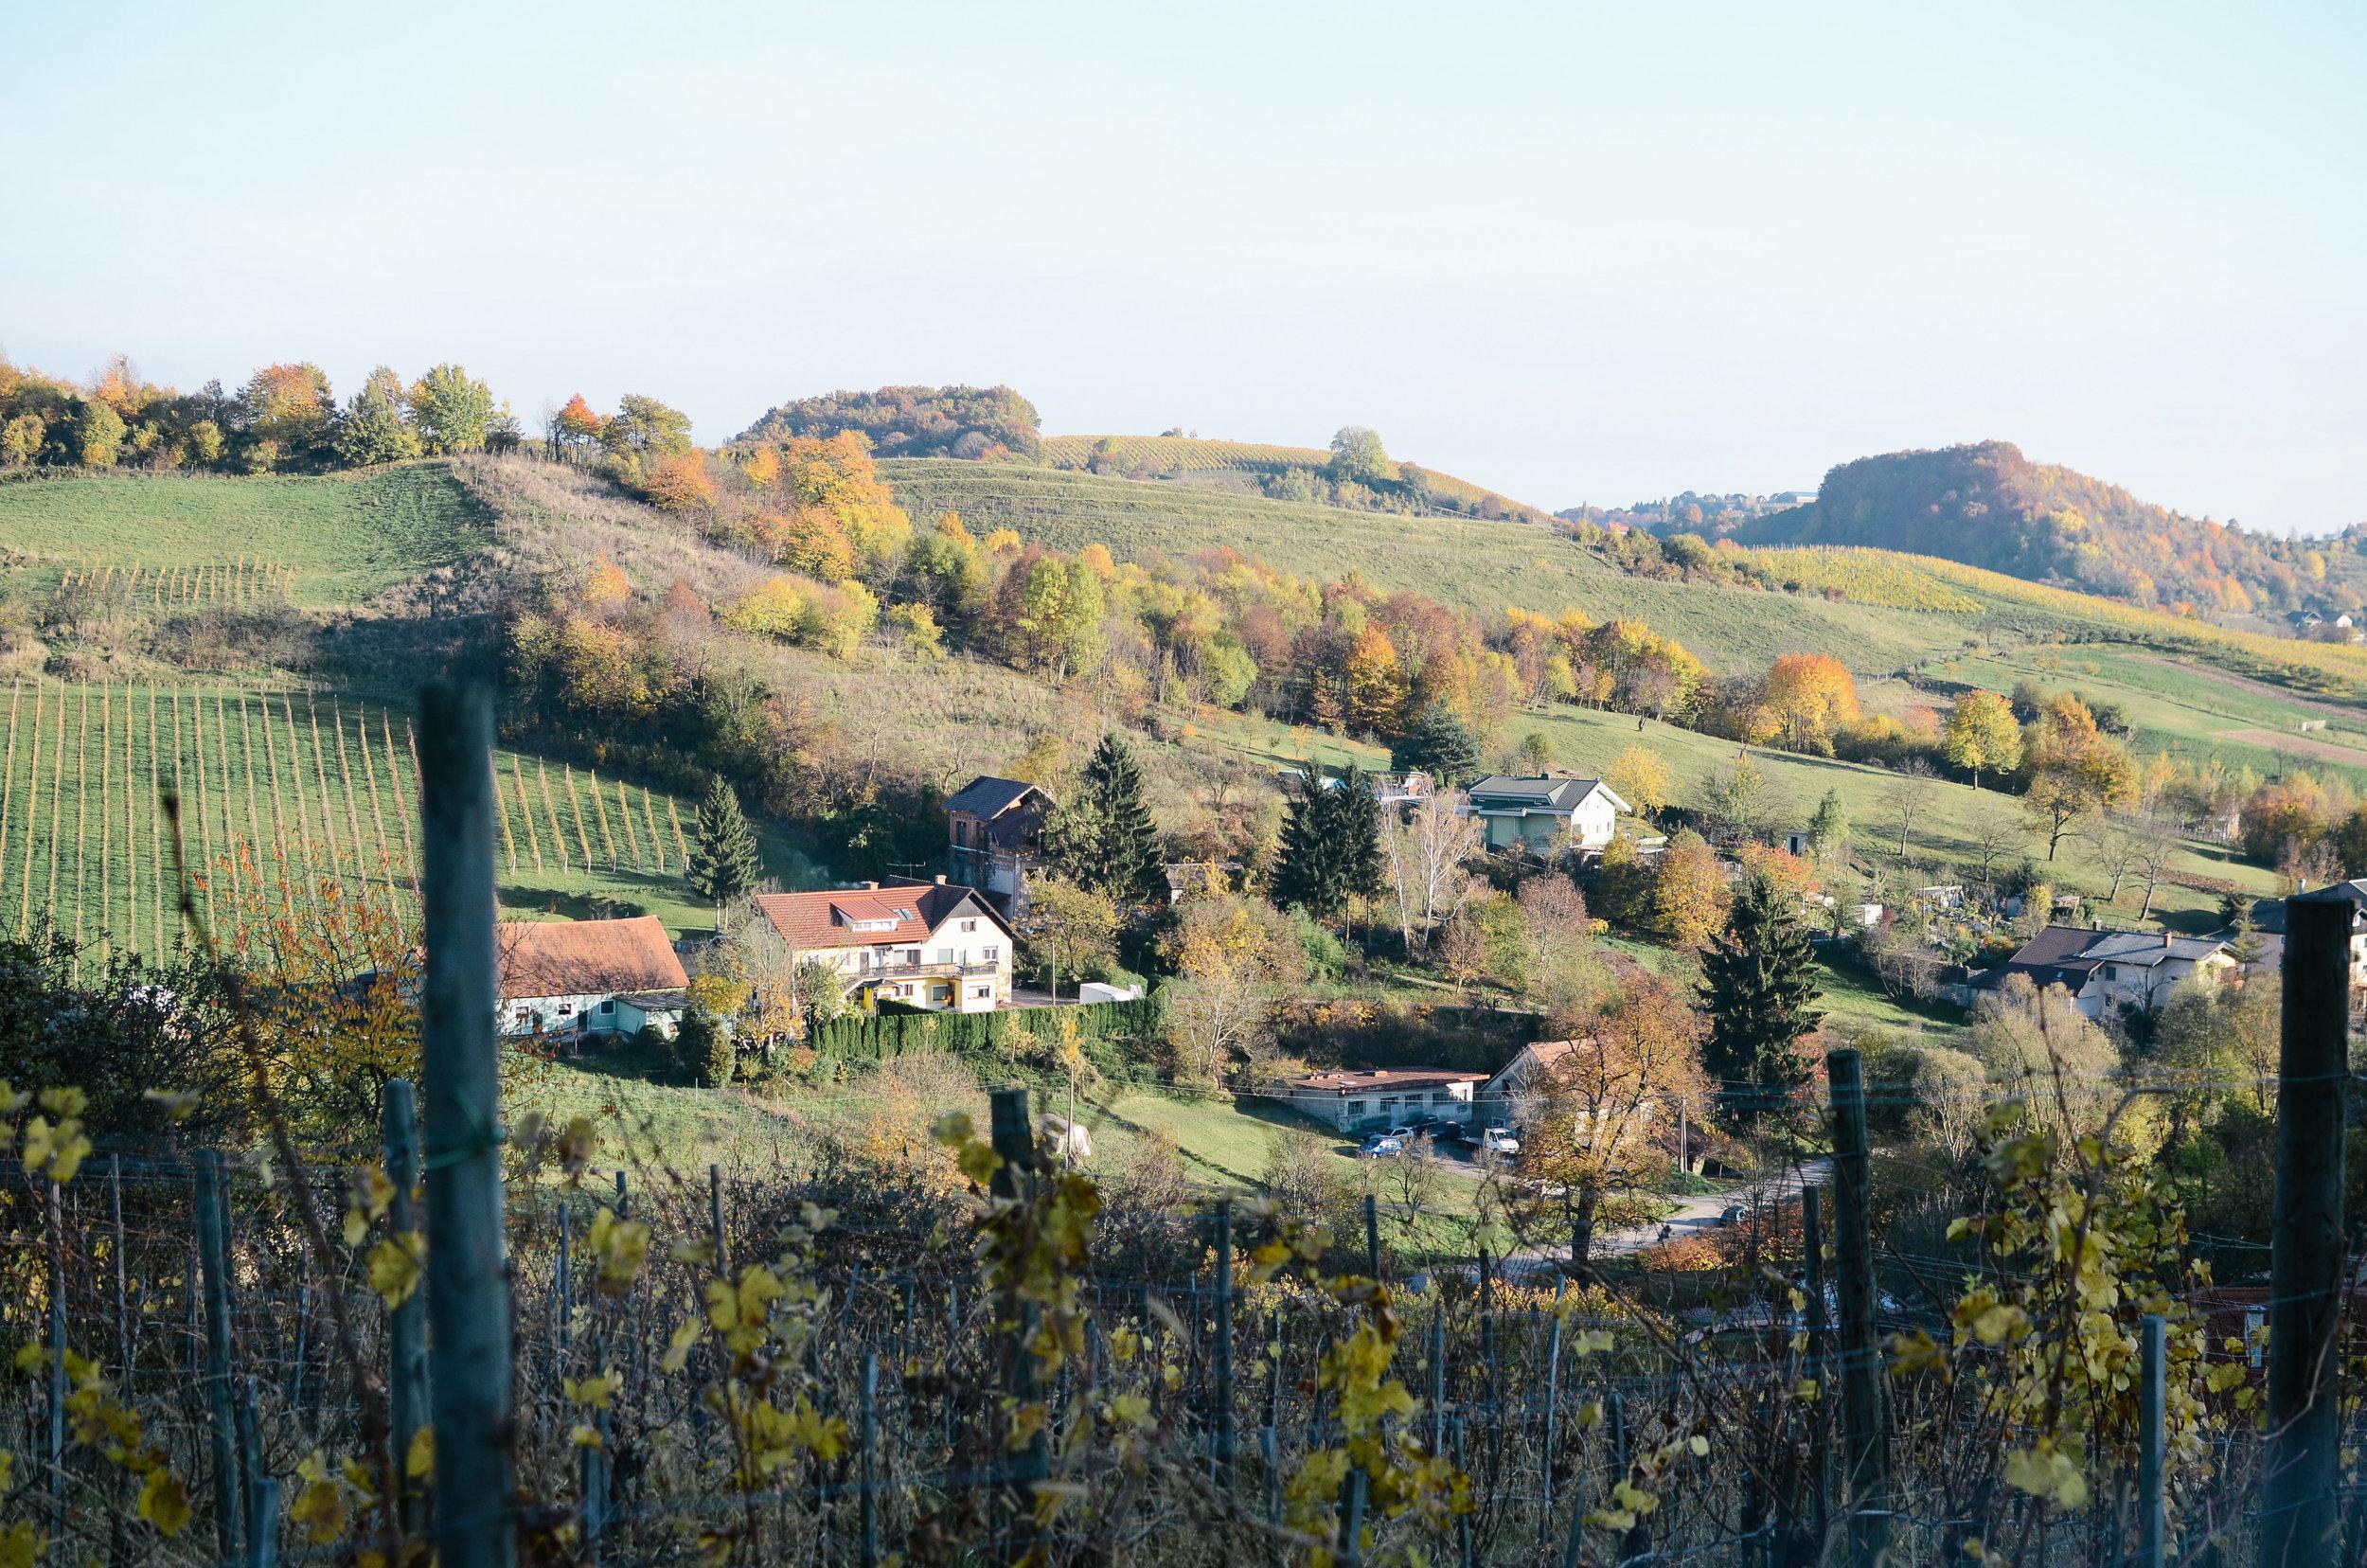 slovenia-travel-glamping-chateau-ramsak_DSC_2187.jpg